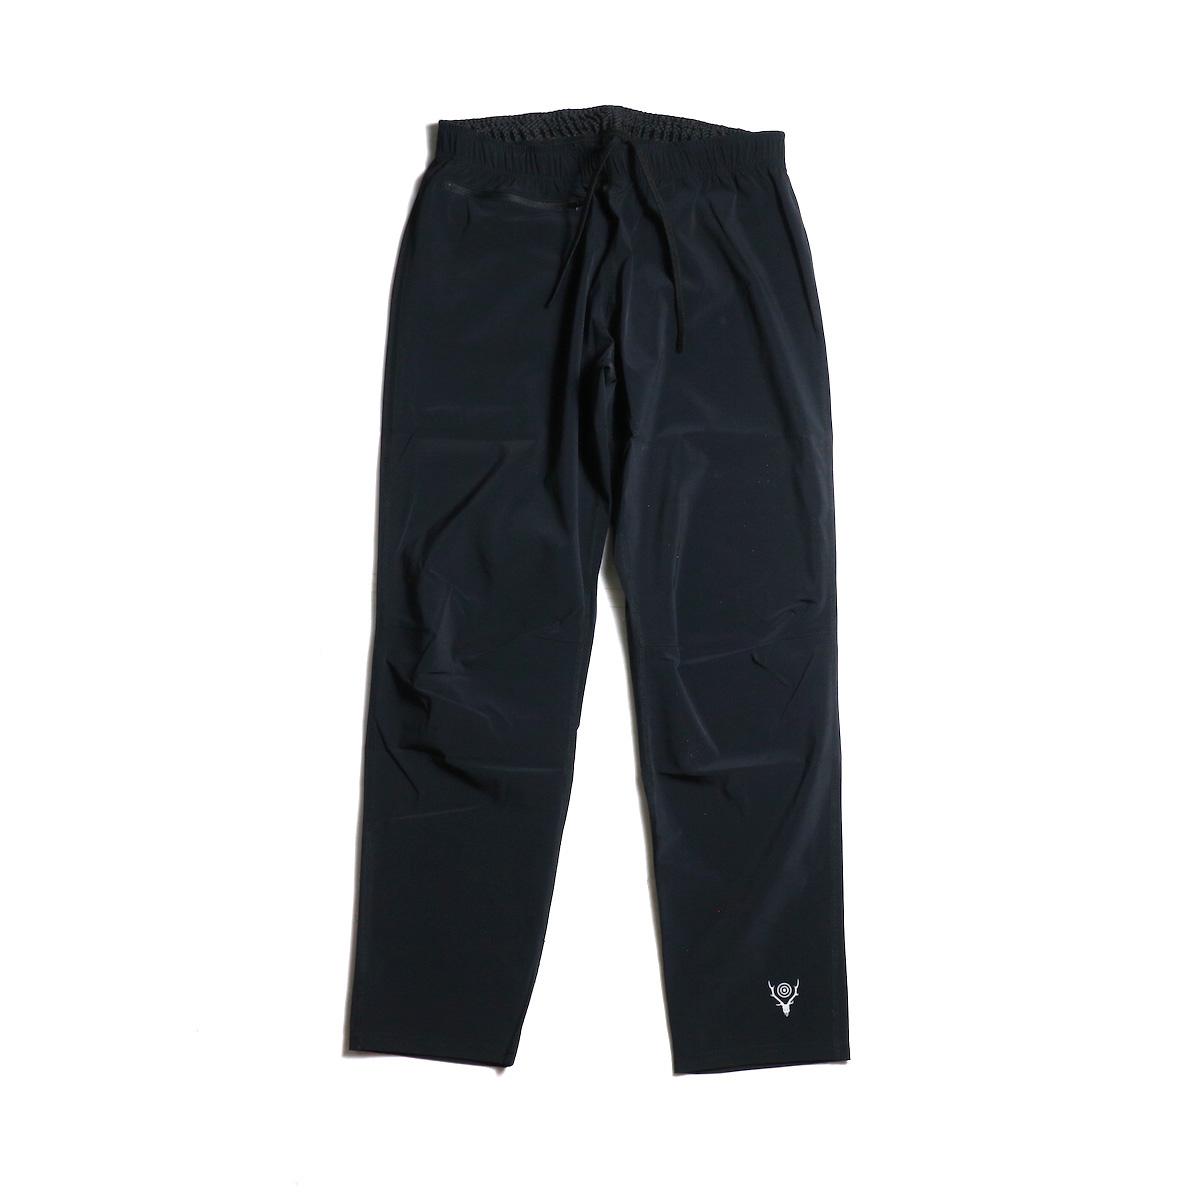 SOUTH2 WEST8 / 1P Cycle Pant-N/Pu Taffeta (Black) 正面